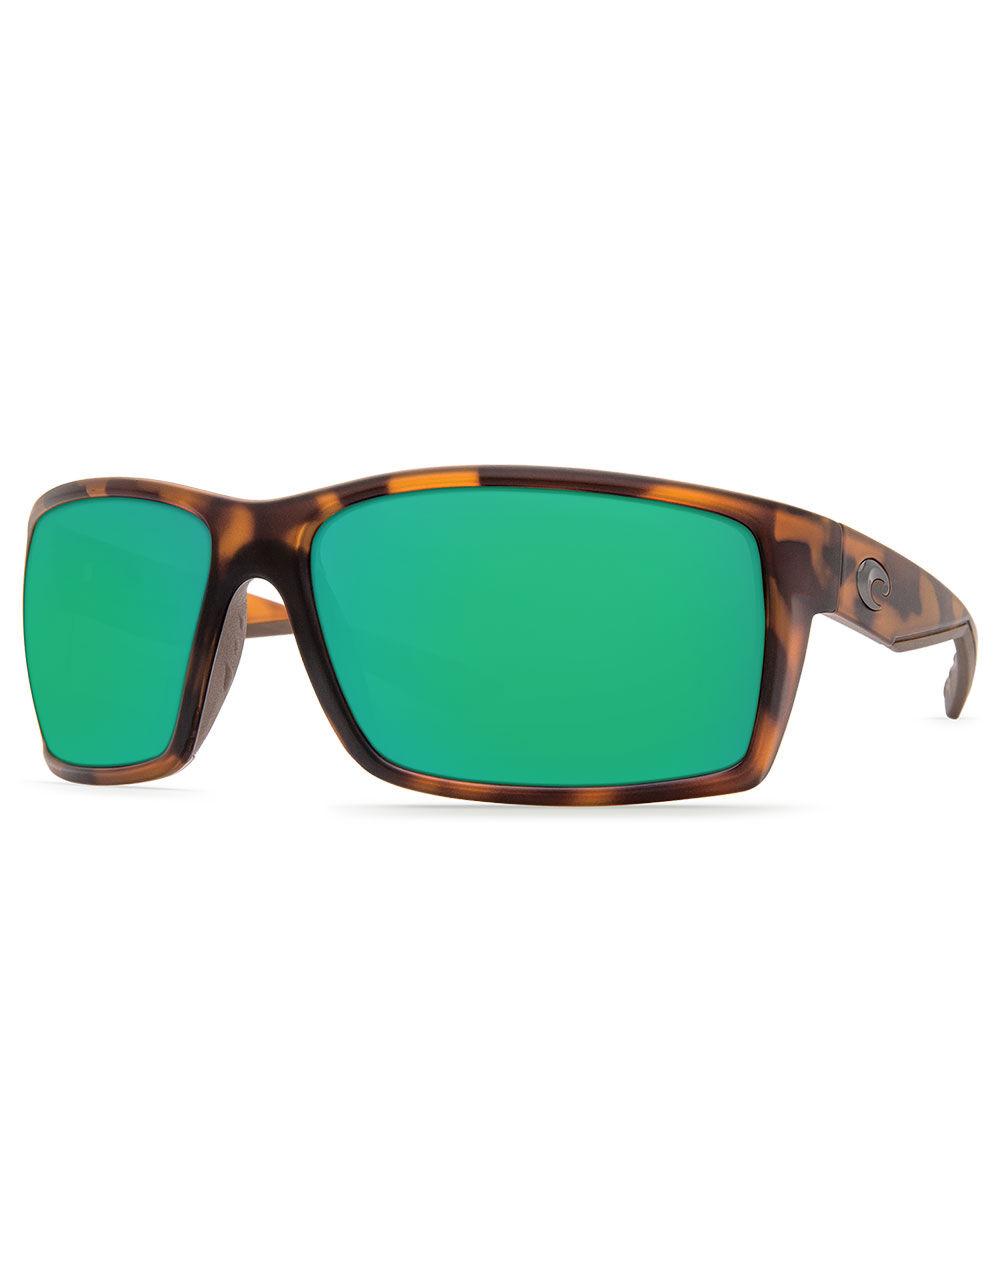 COSTA Reefton Tortoise & Green Polarized Sunglasses